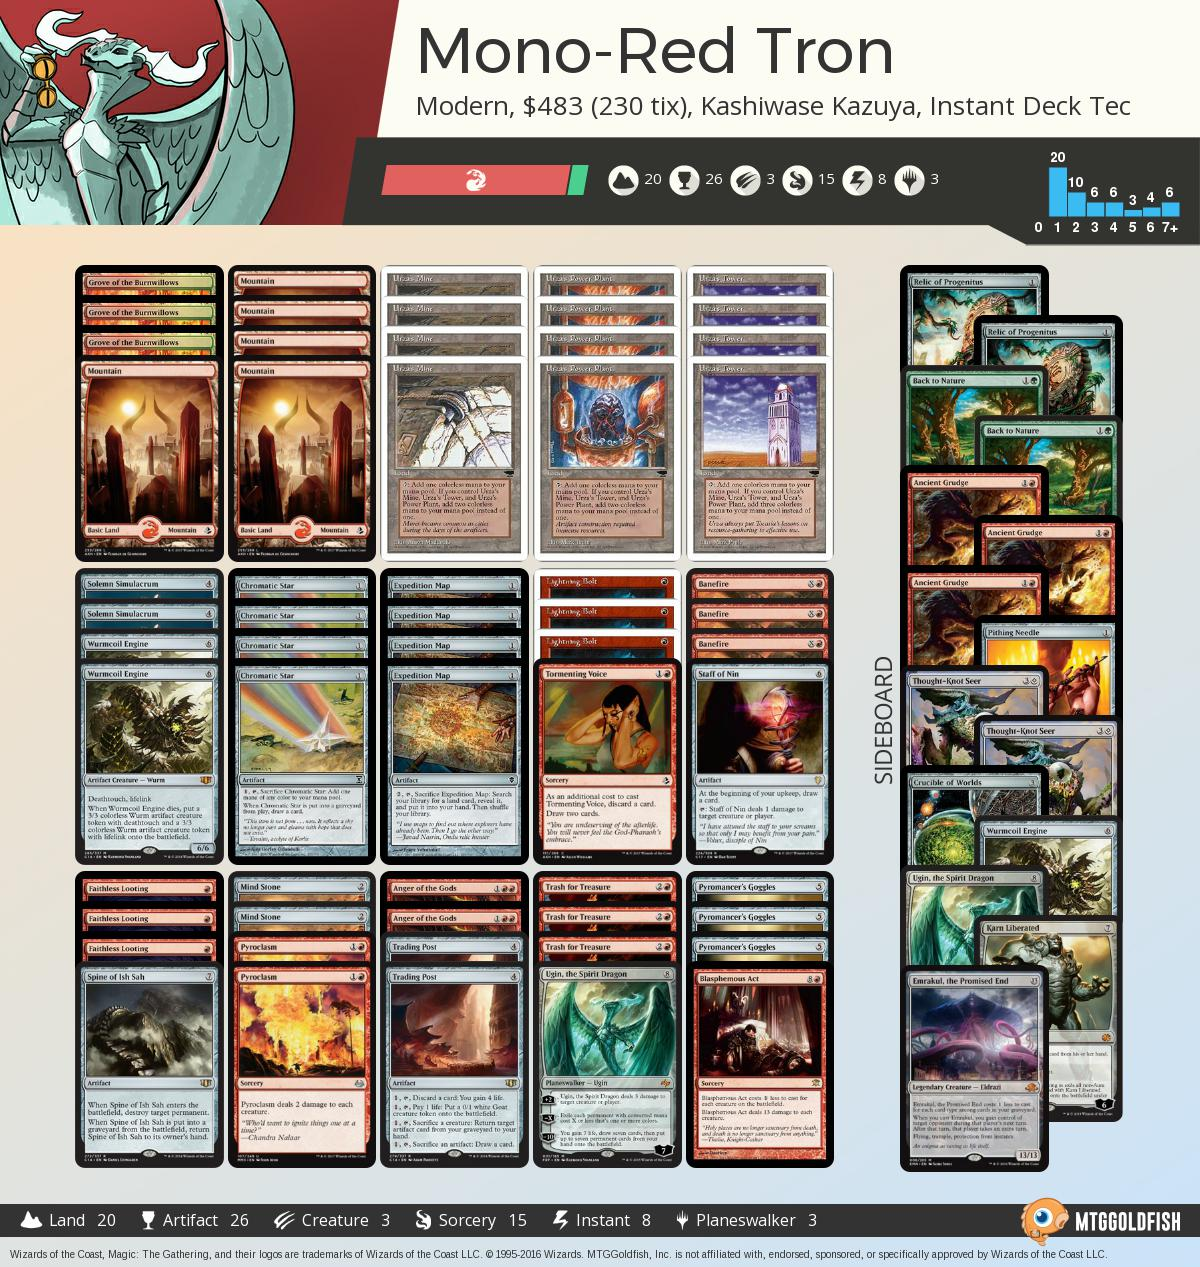 Mono red%2btron 5962ecd2 cbaa 47ab 9703 60f3352d6cbd%2ejpg